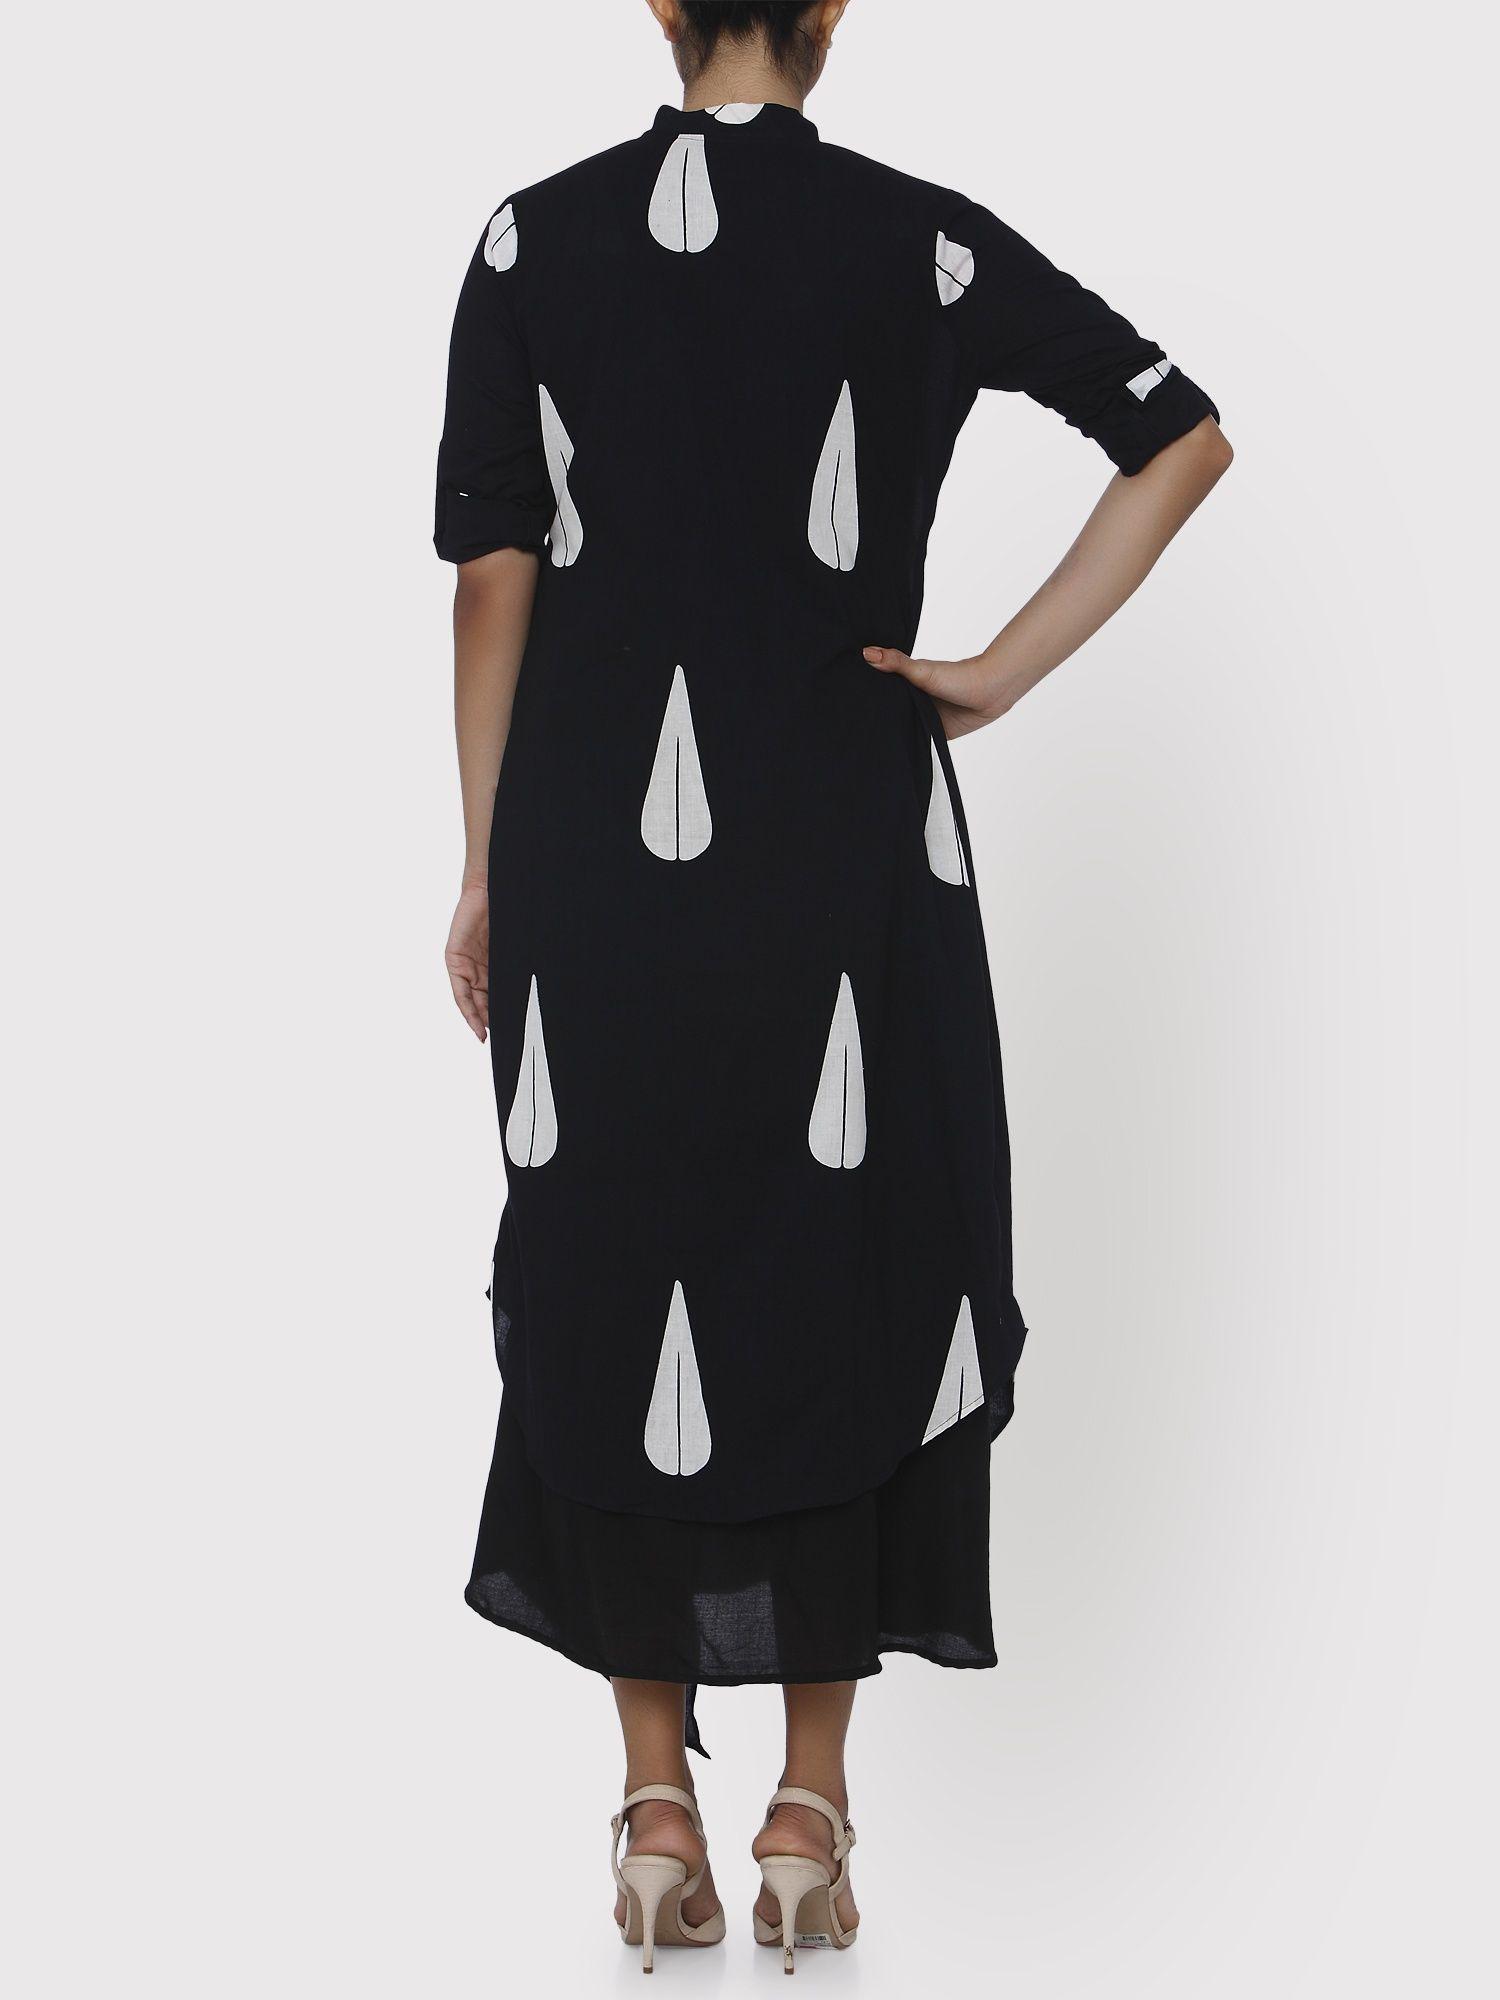 Keva Black Block Print Cape Dress